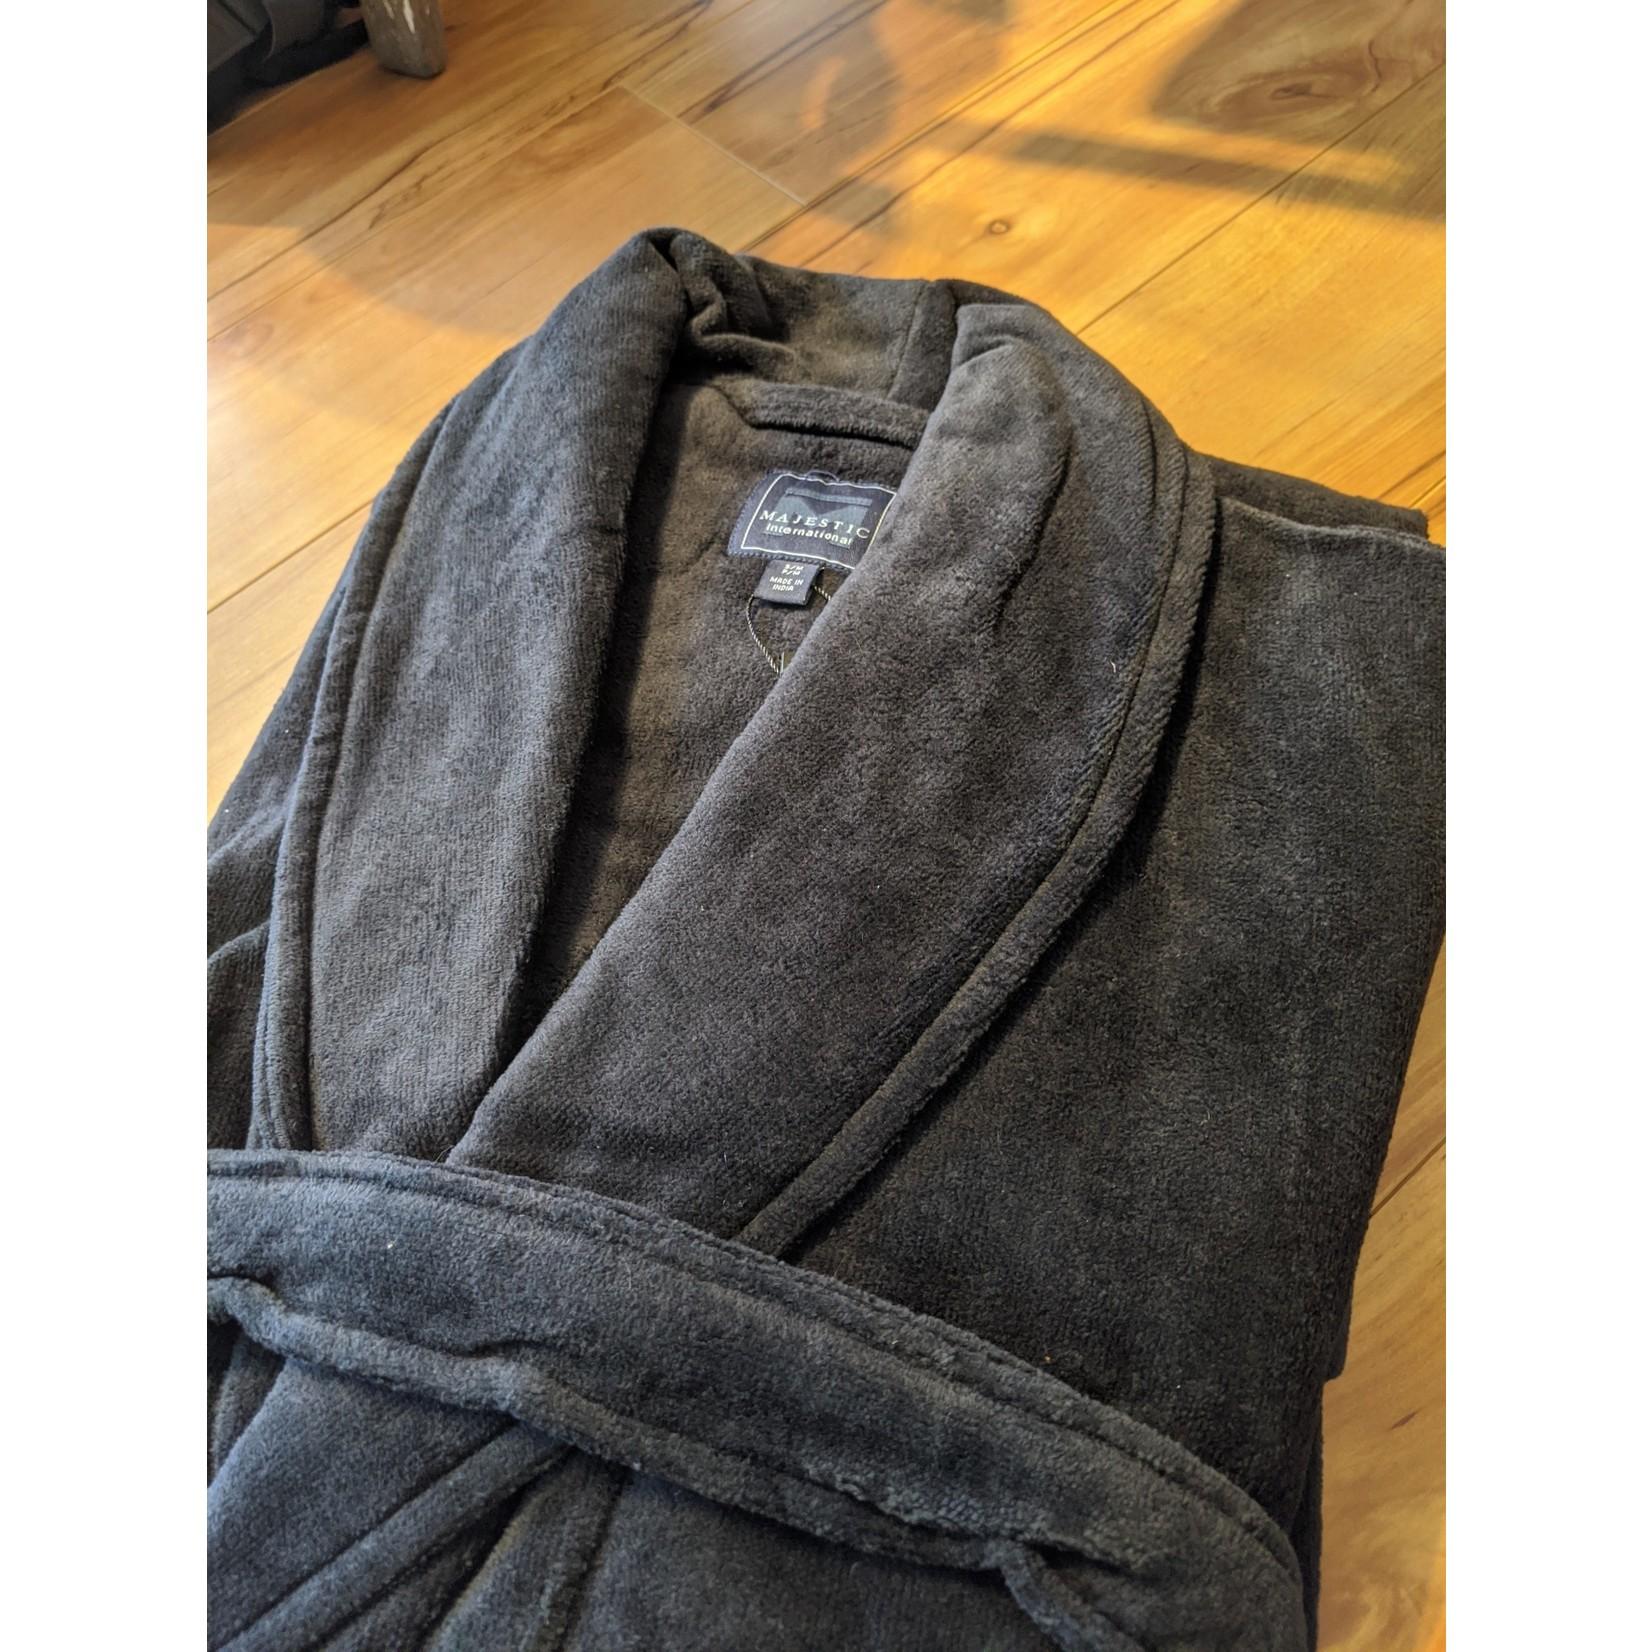 Majestic Majestic Terry Velour Shawl Robe